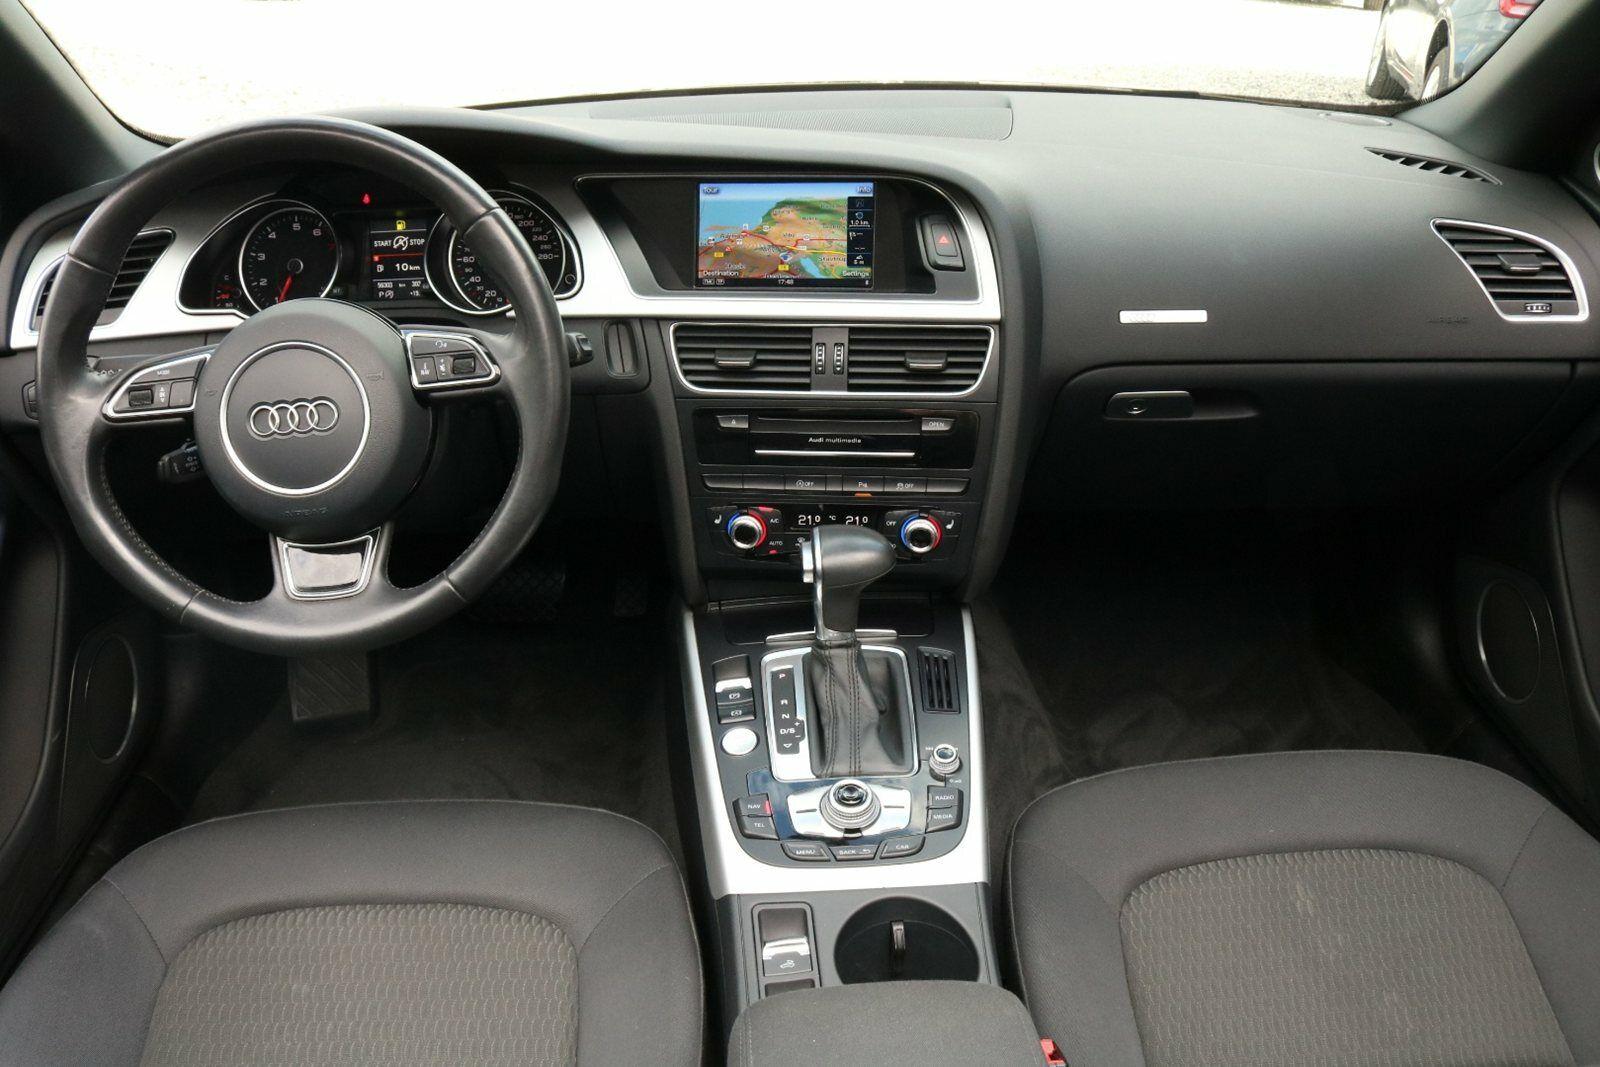 Audi A5 TFSi 177 S-line Cabriolet Mult